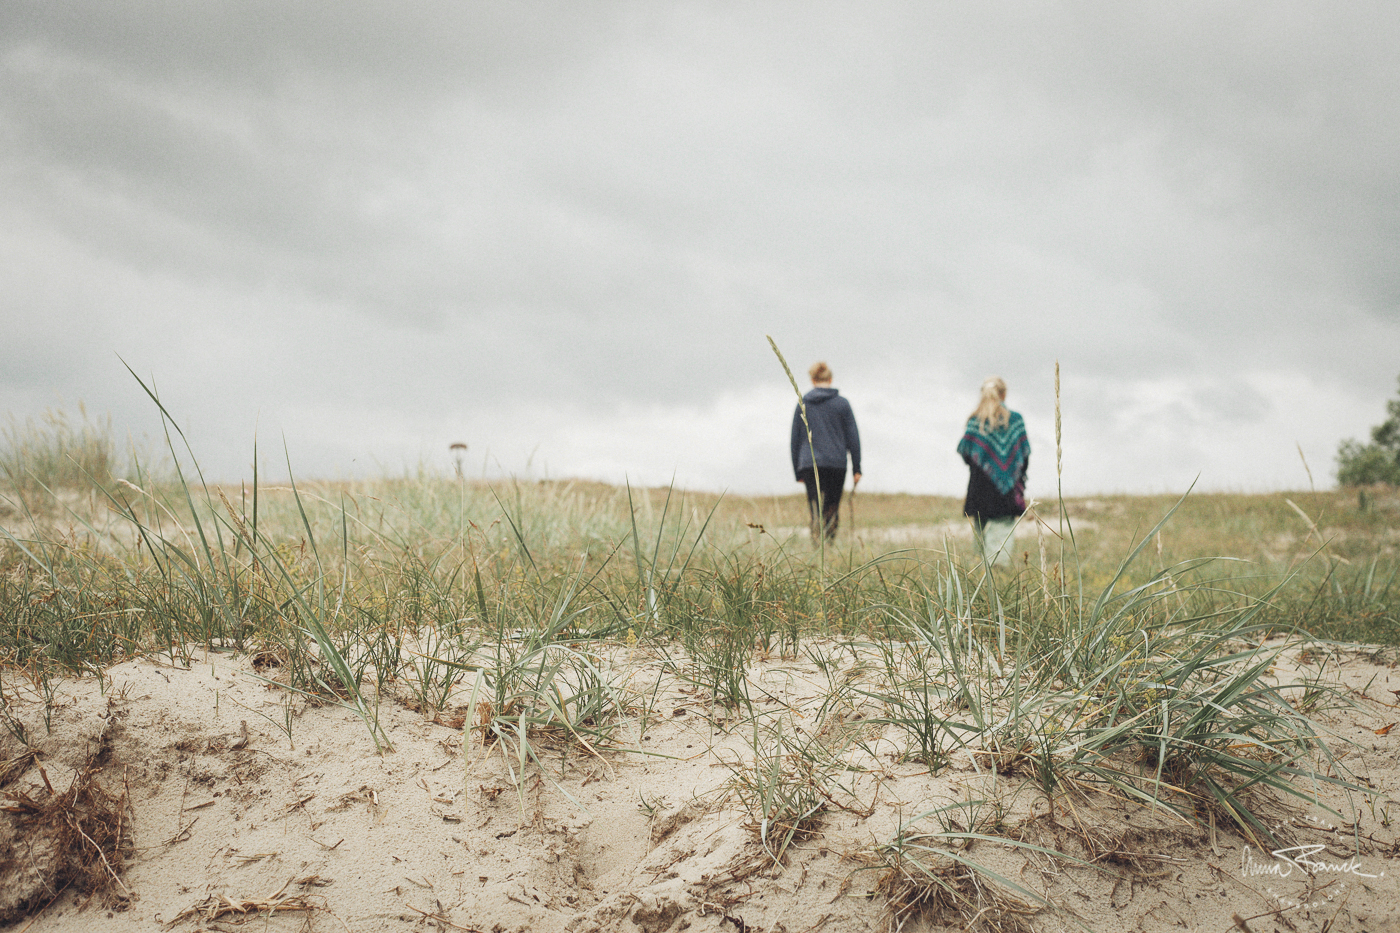 anna, franck, photography, stockholm, photographer, pargas, finland, sweden, portraits, skåne, österlen, baskemölla, natural, green, summer, countrylife, coast, beach, architecture, lifestyle, organic living, baltic